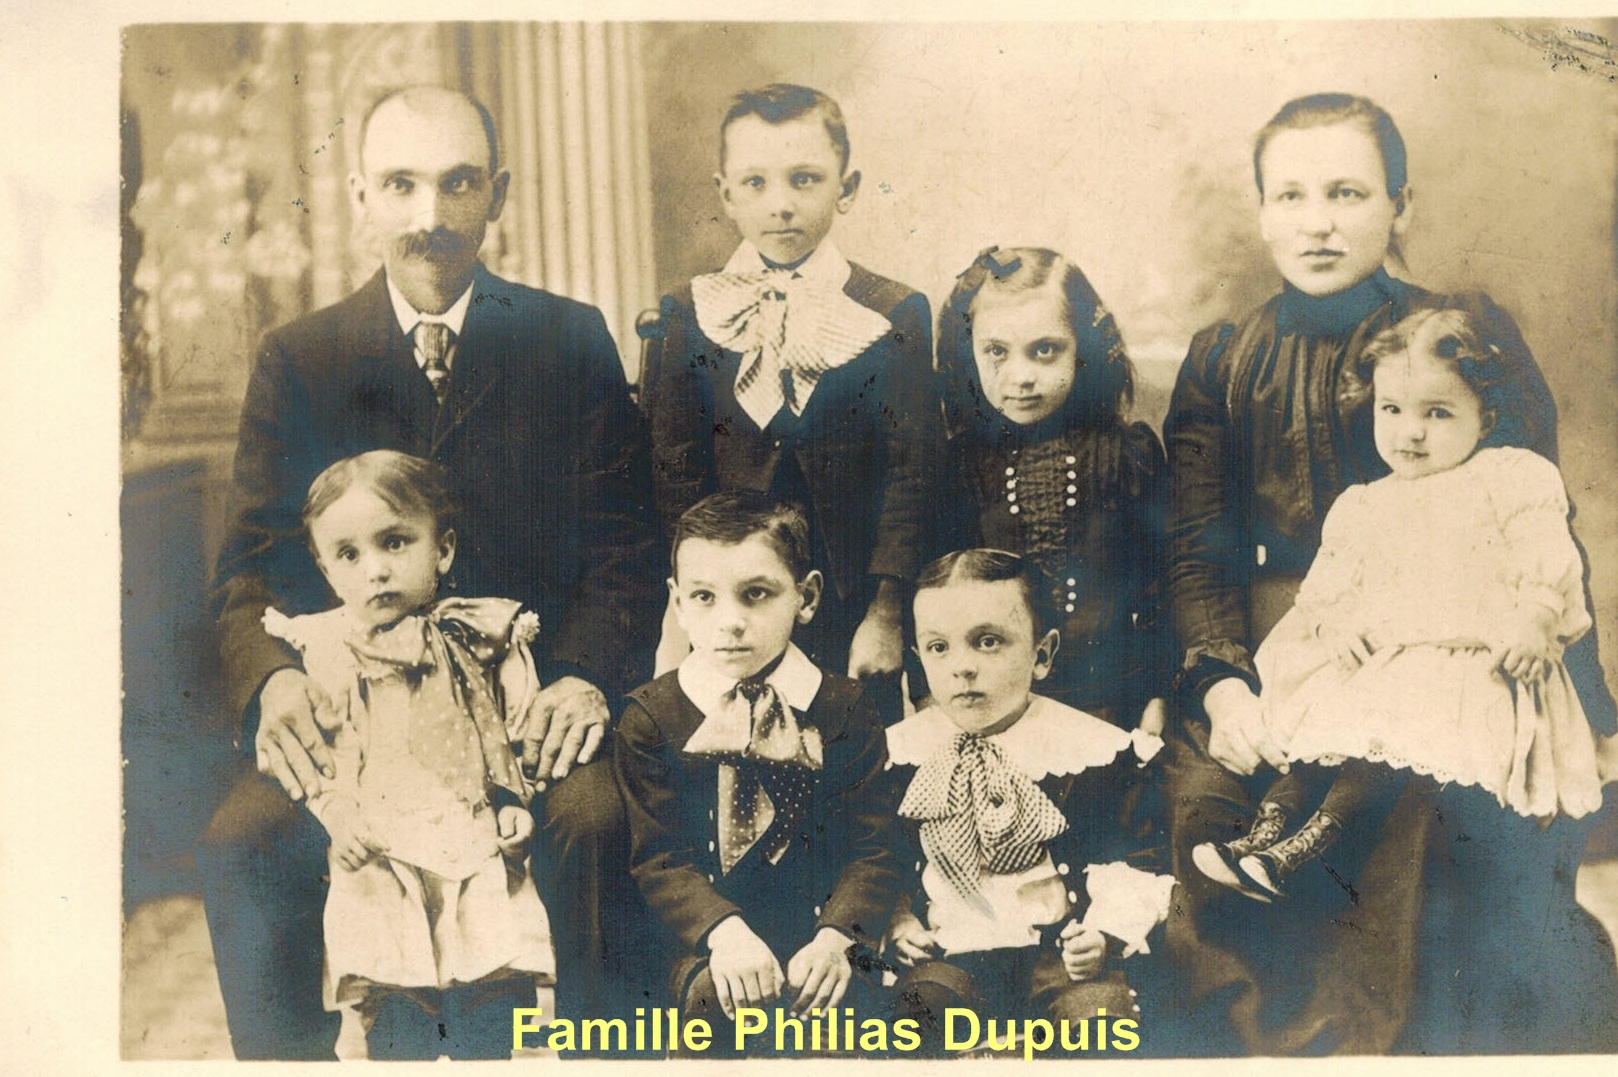 Famille Philias Dupuis